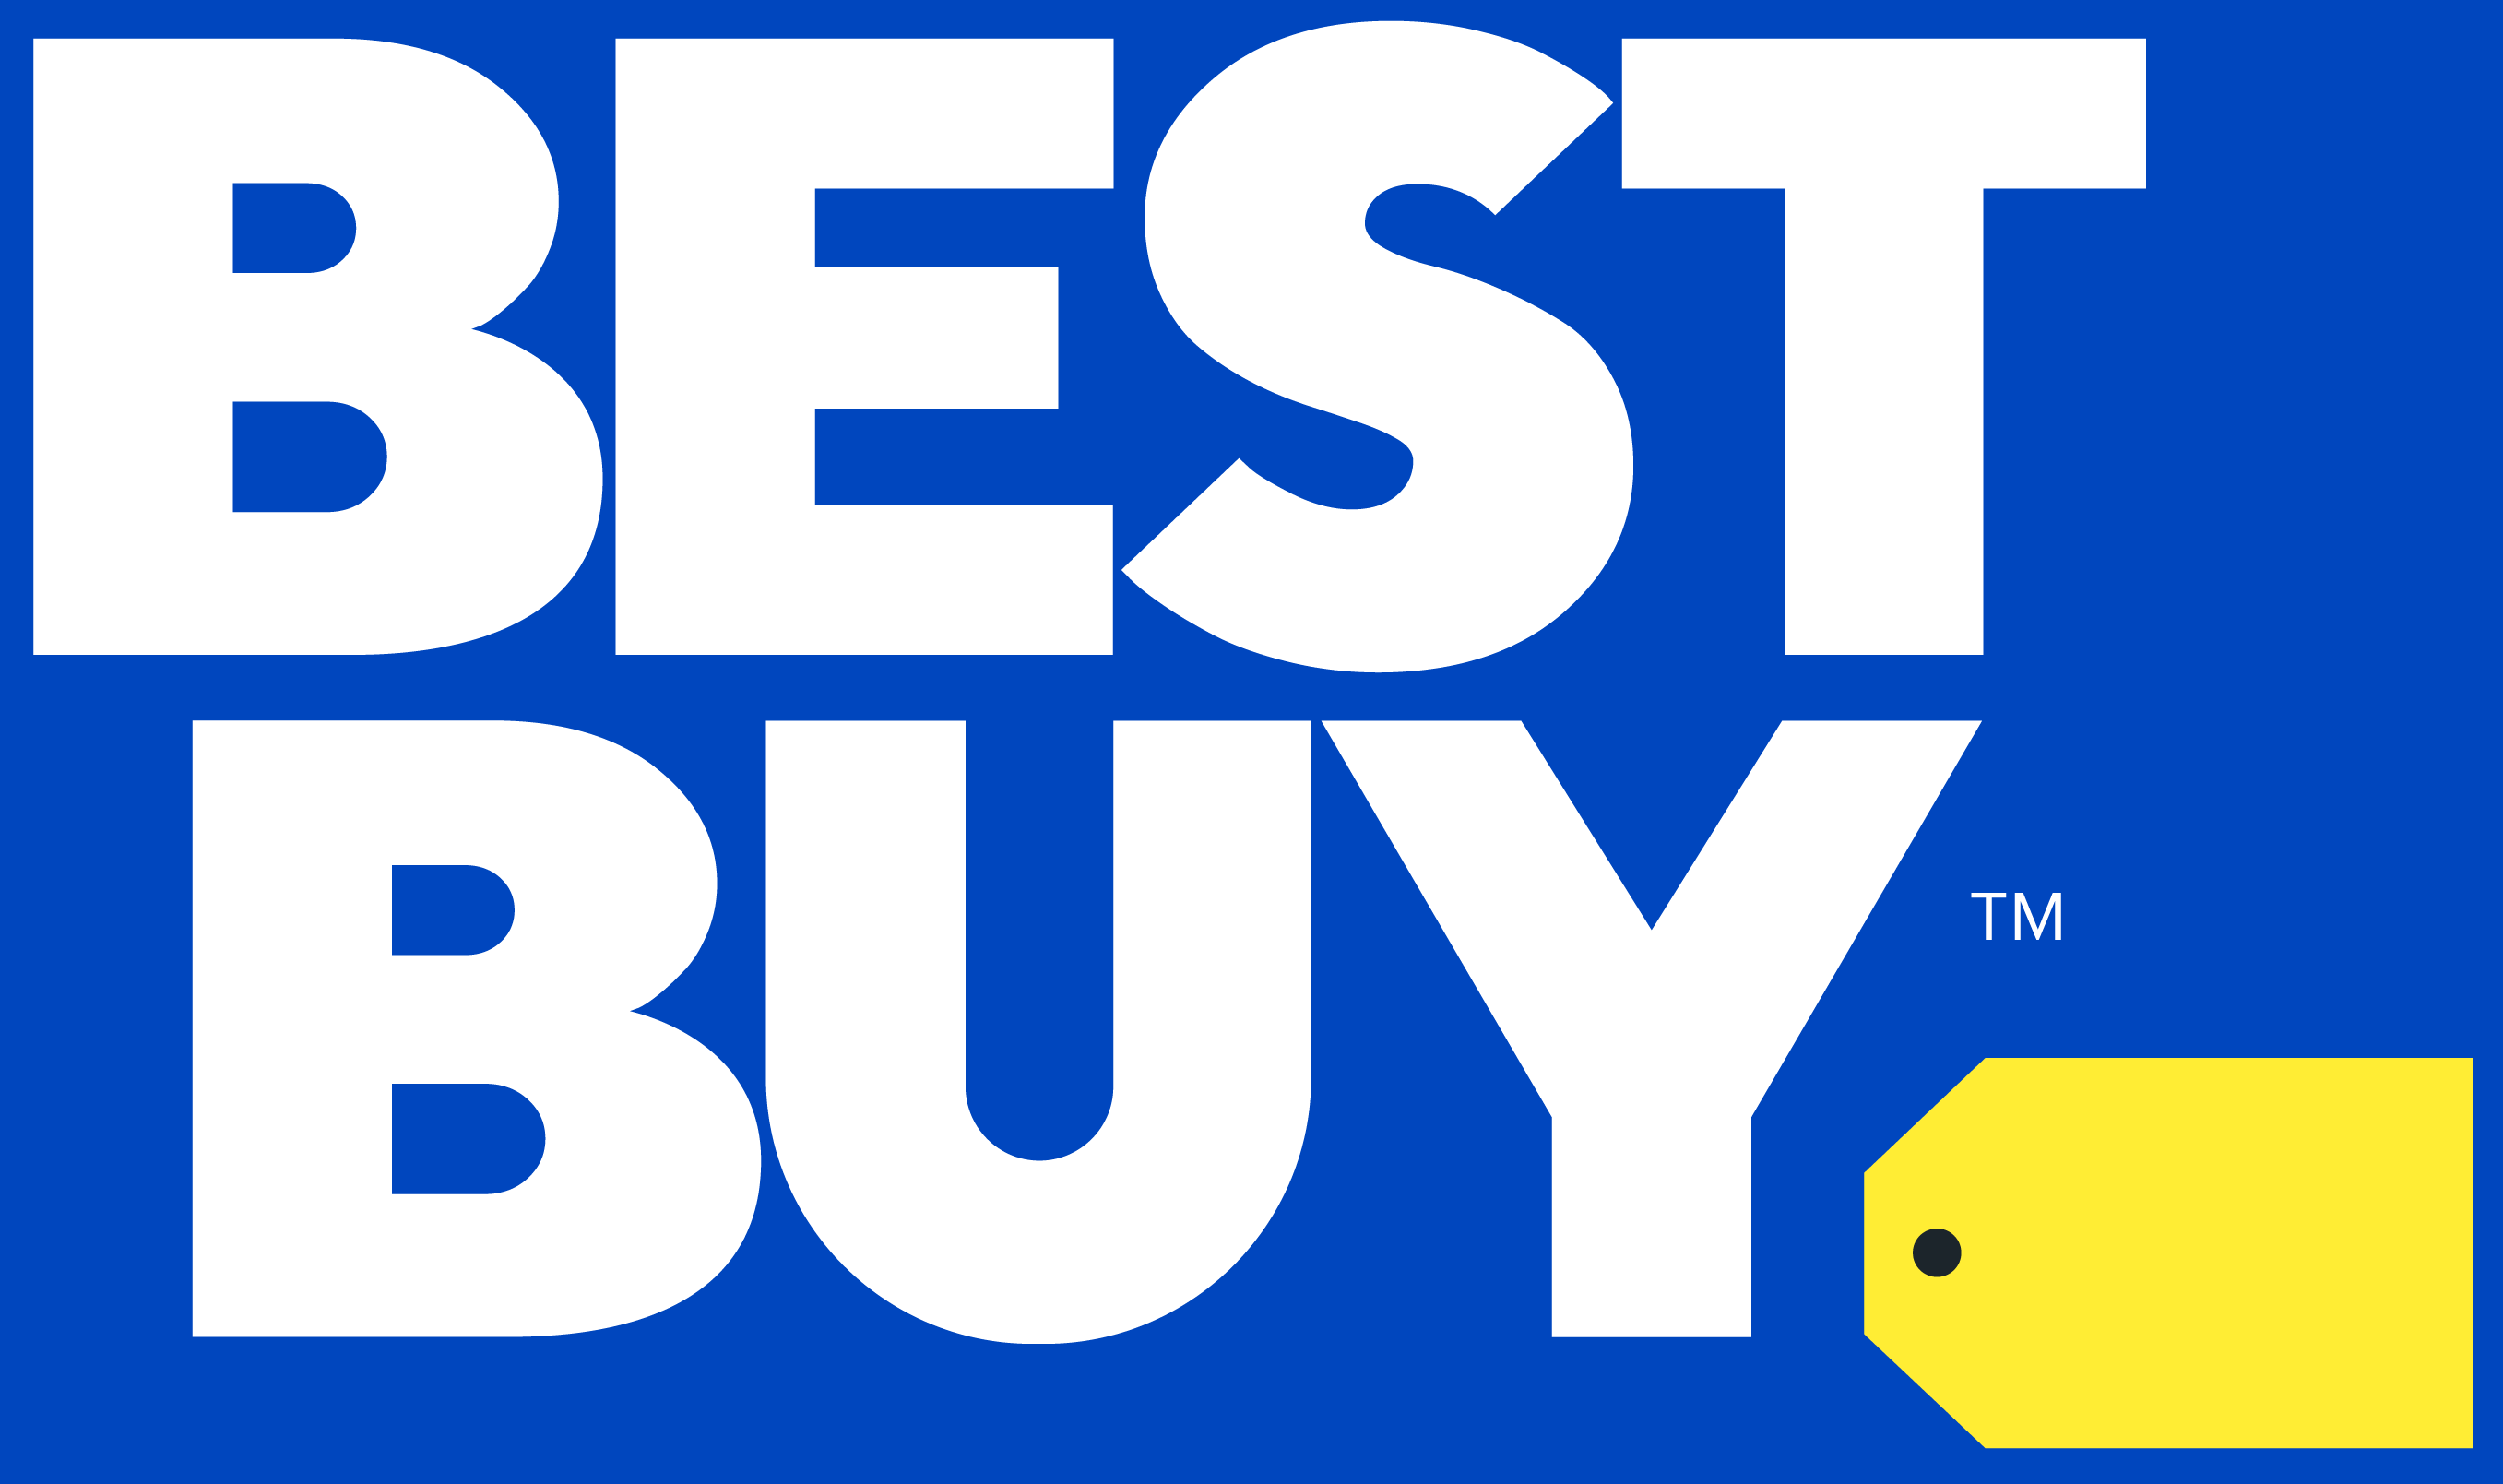 Best Buy's logo